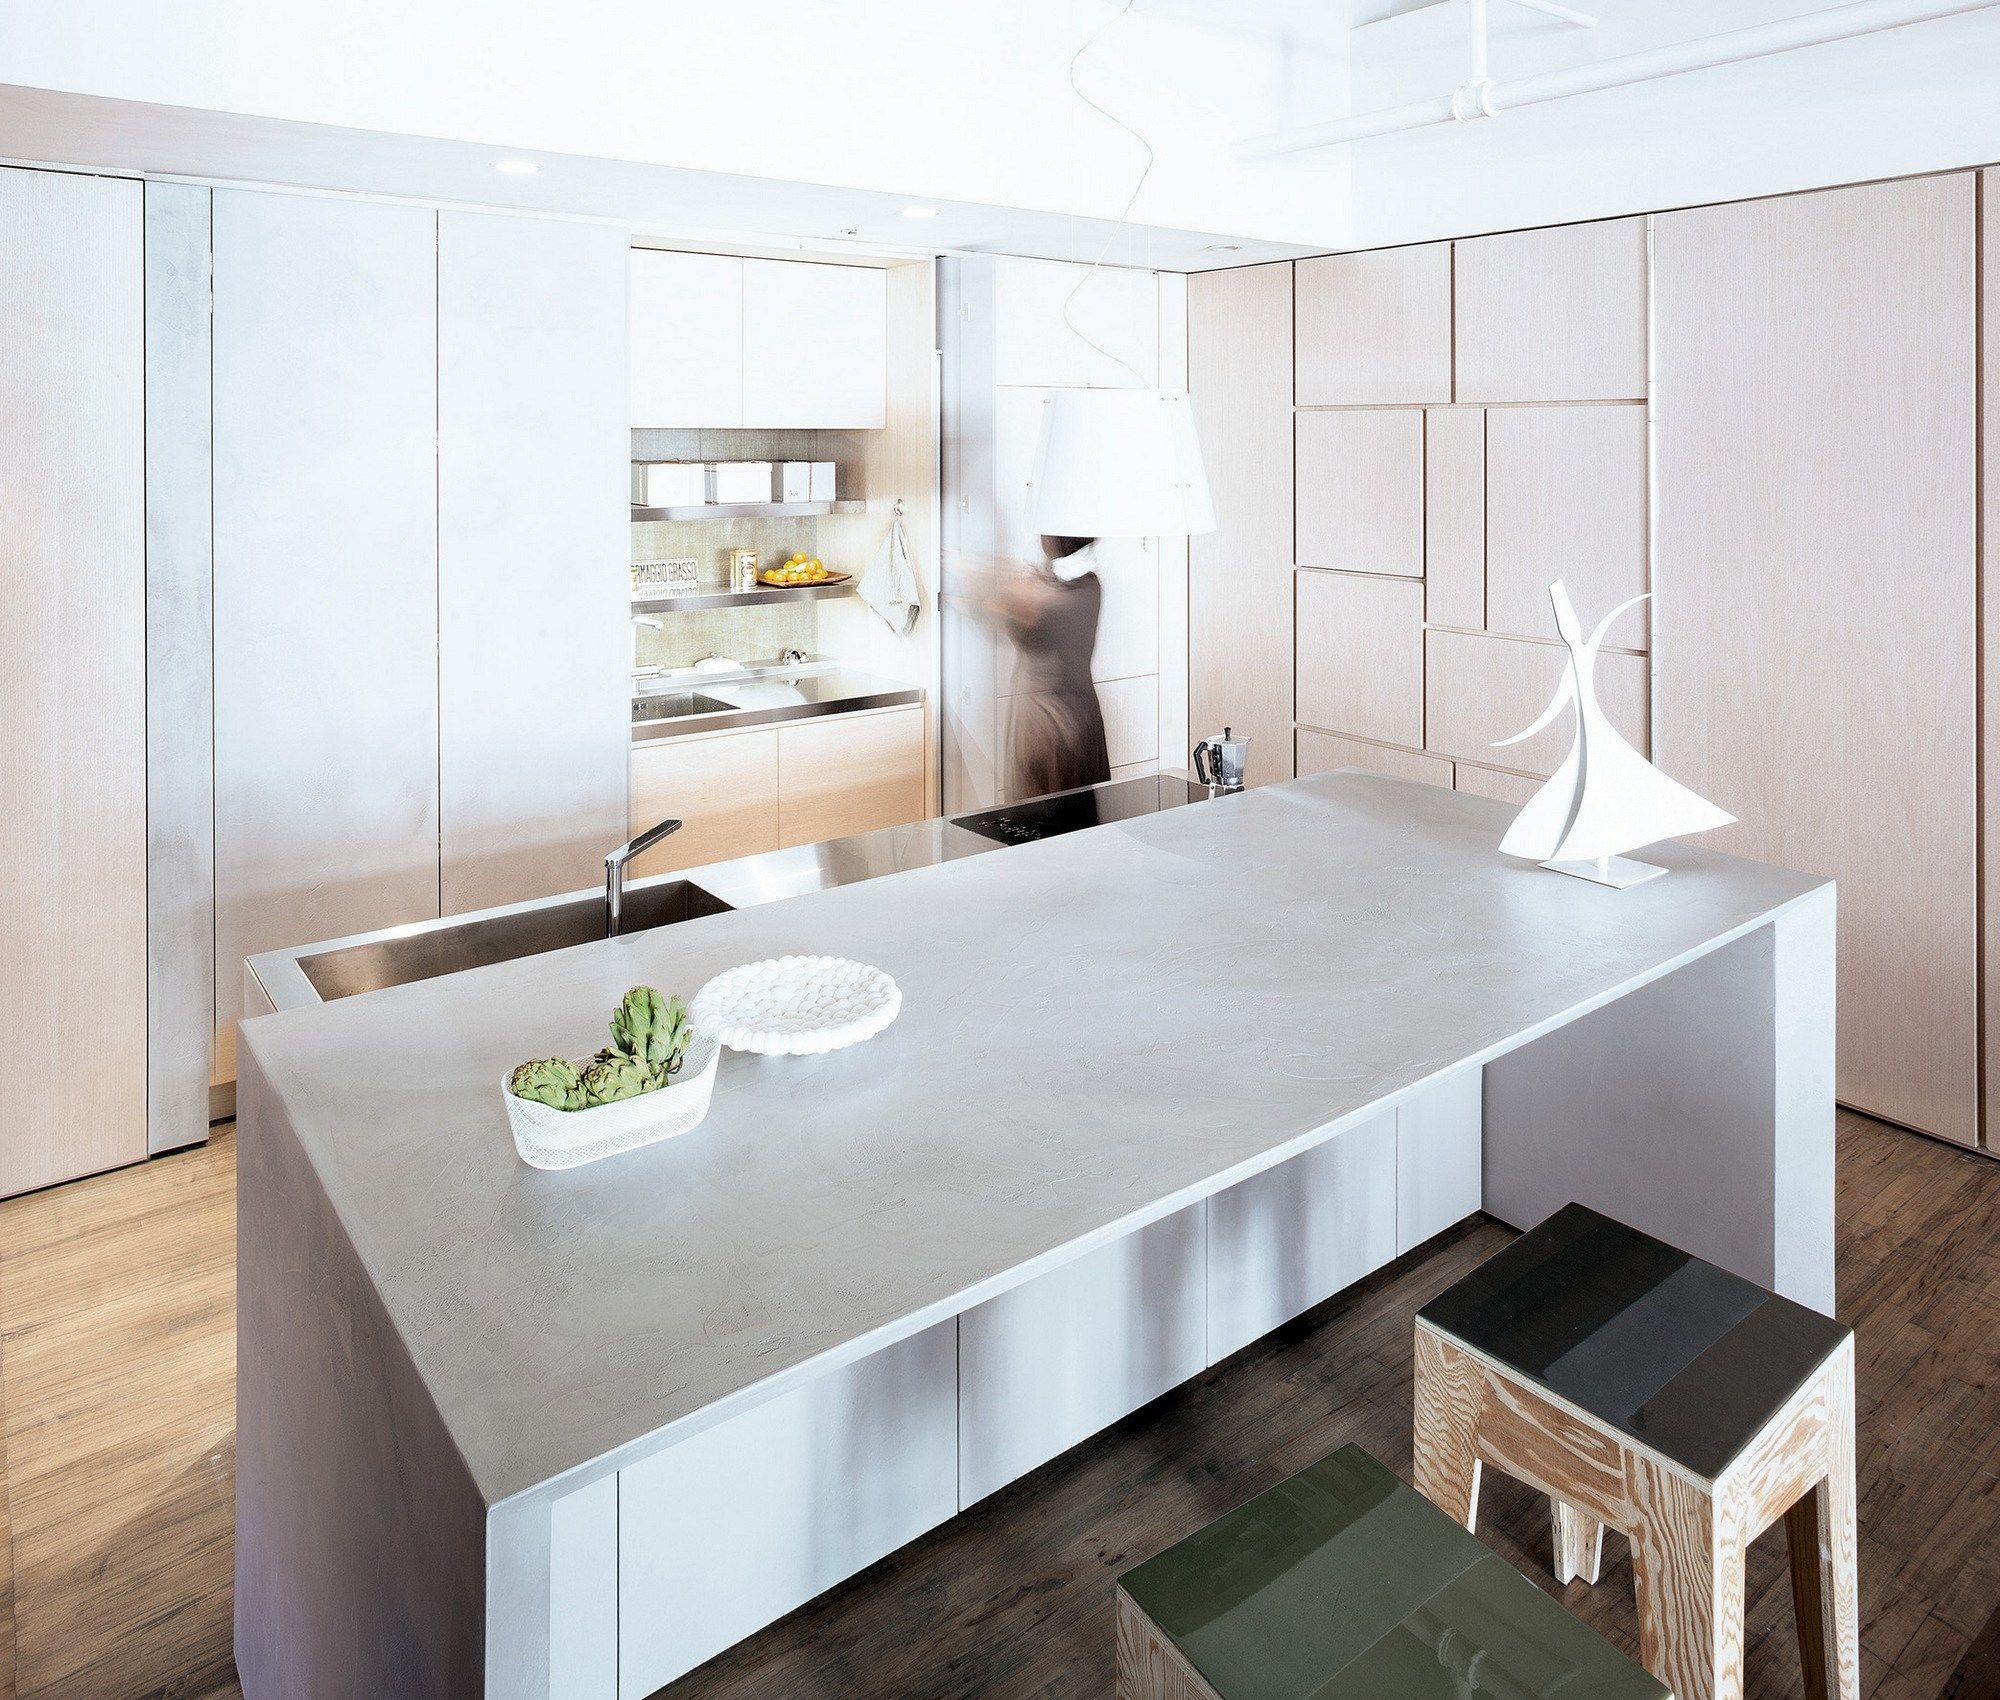 Cucina con isola T45 EVO Cucina in legno - TM Italia Cucine